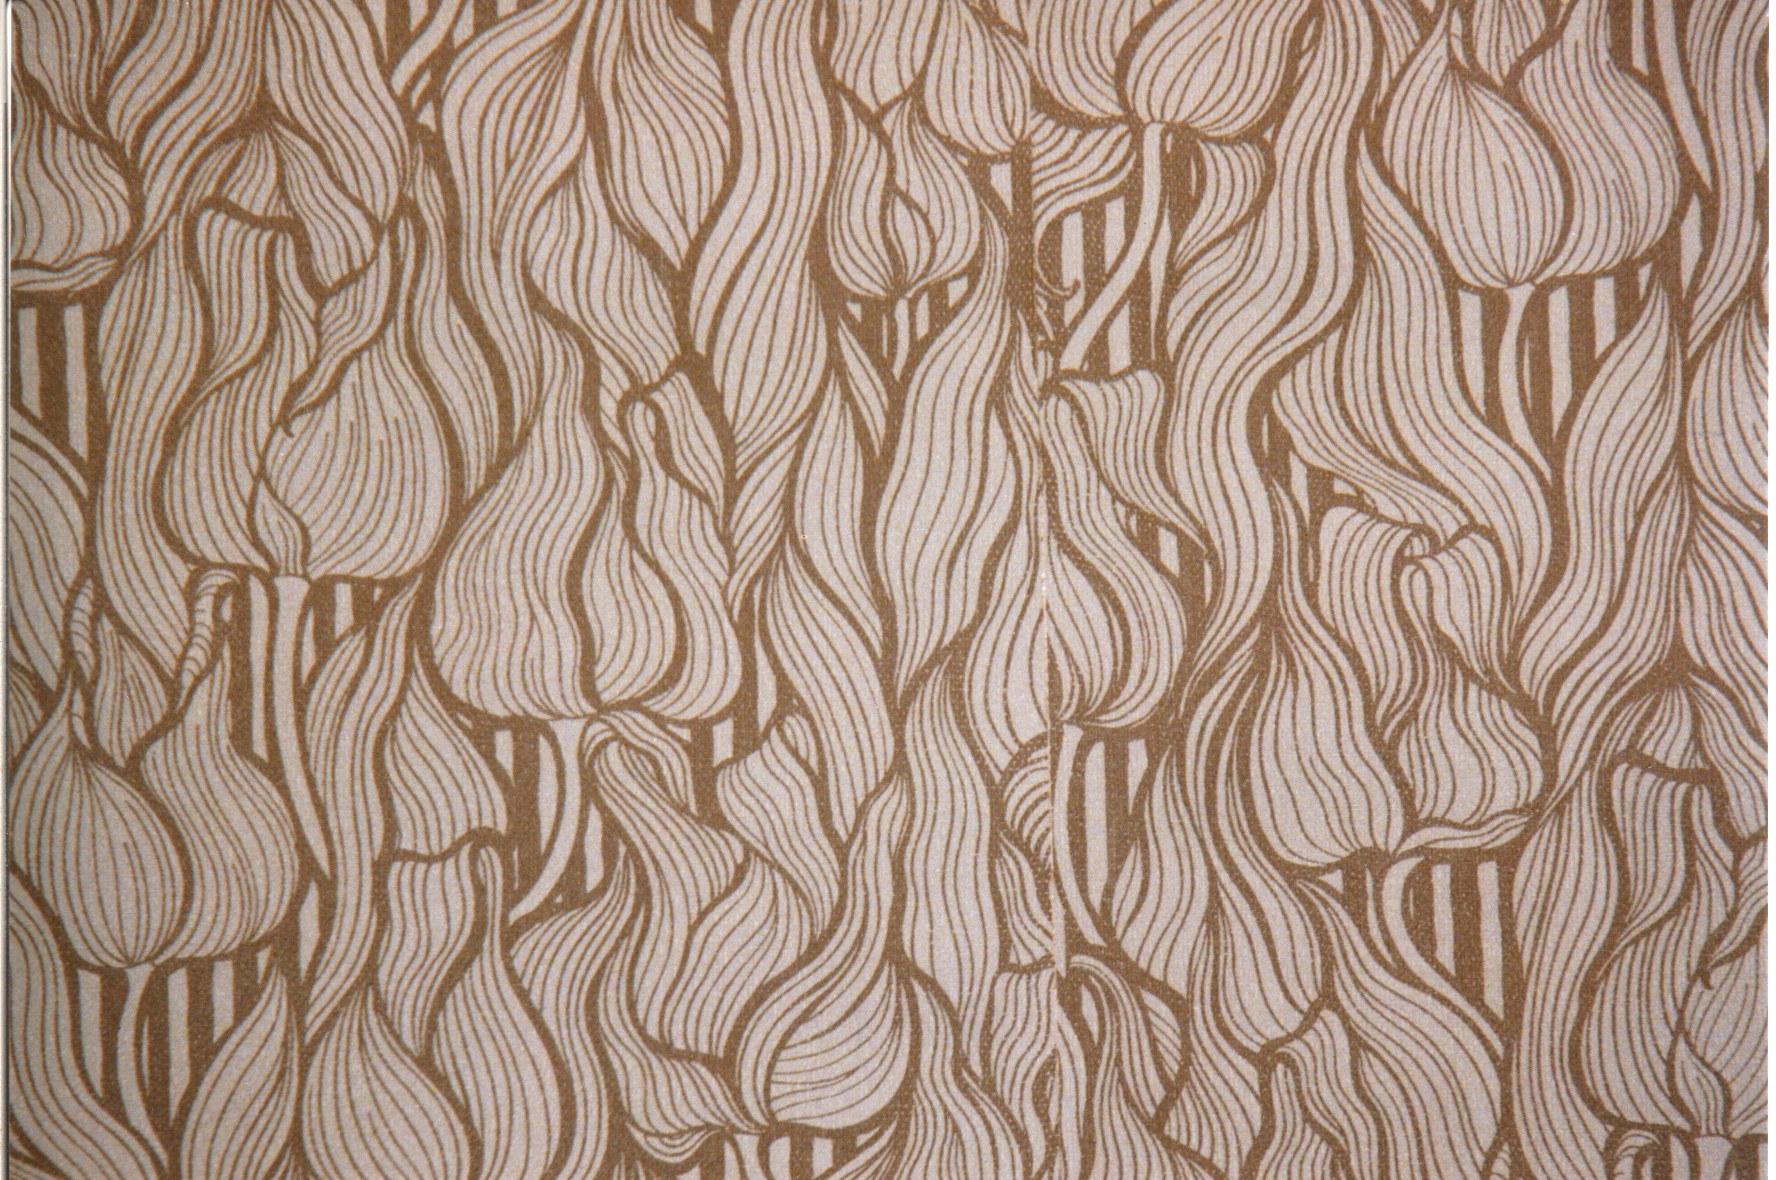 Texture Walls Grasscloth - Tierra Este | #67269